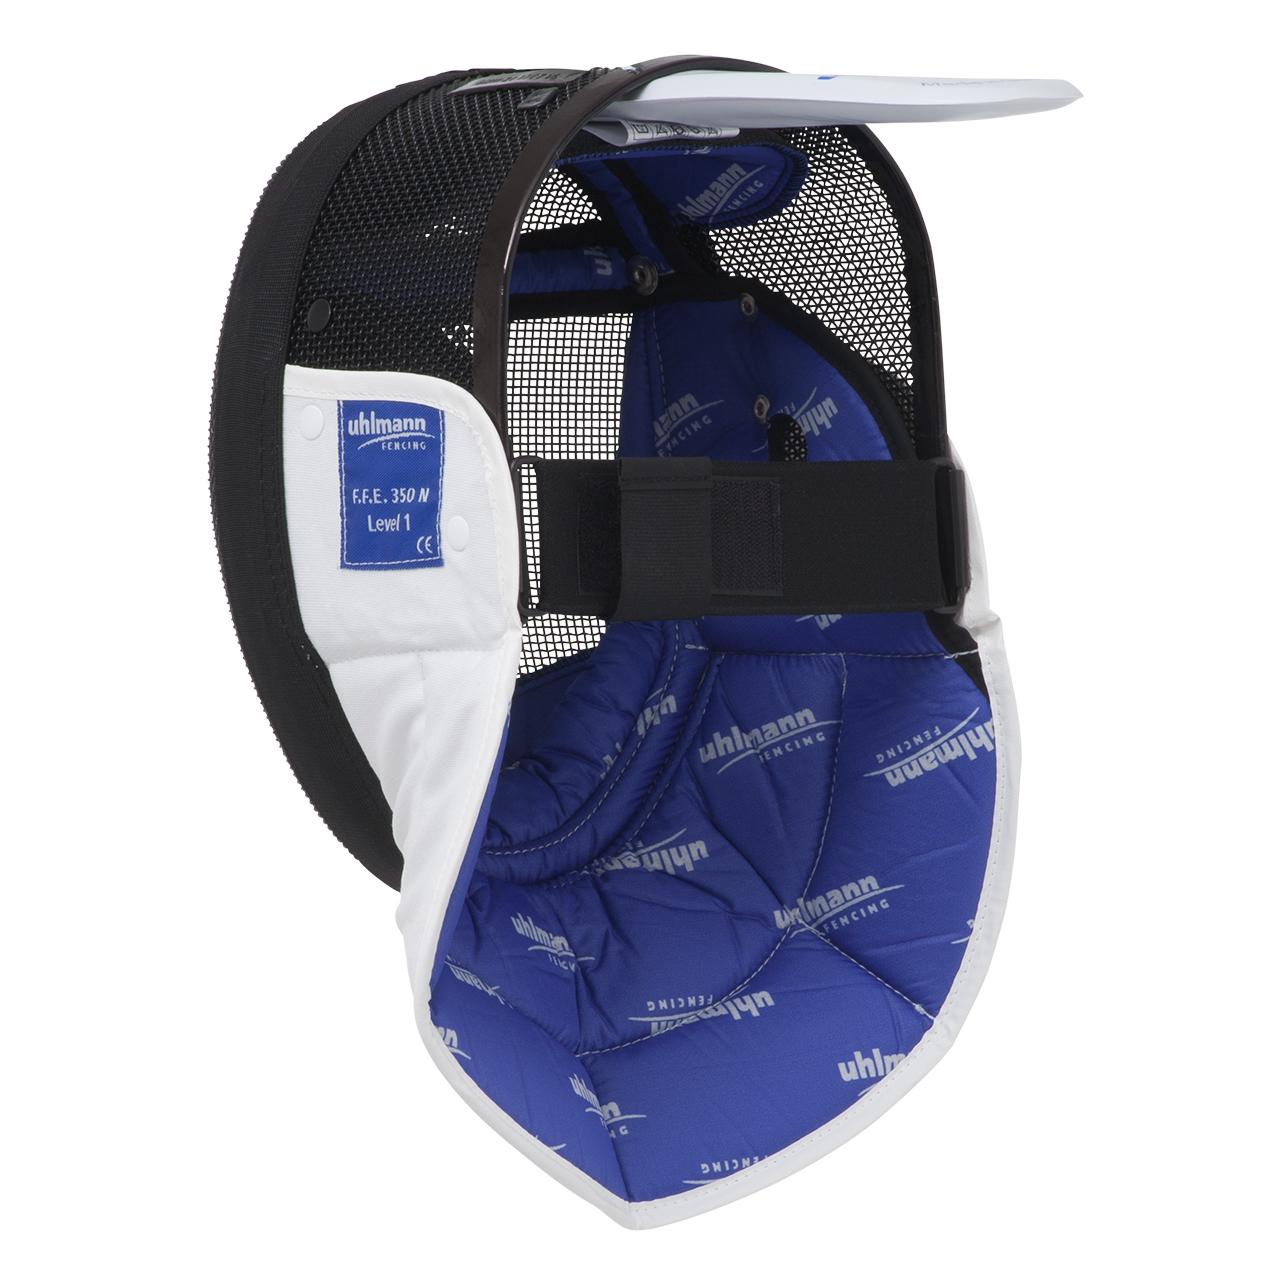 Standard-Maske 350N